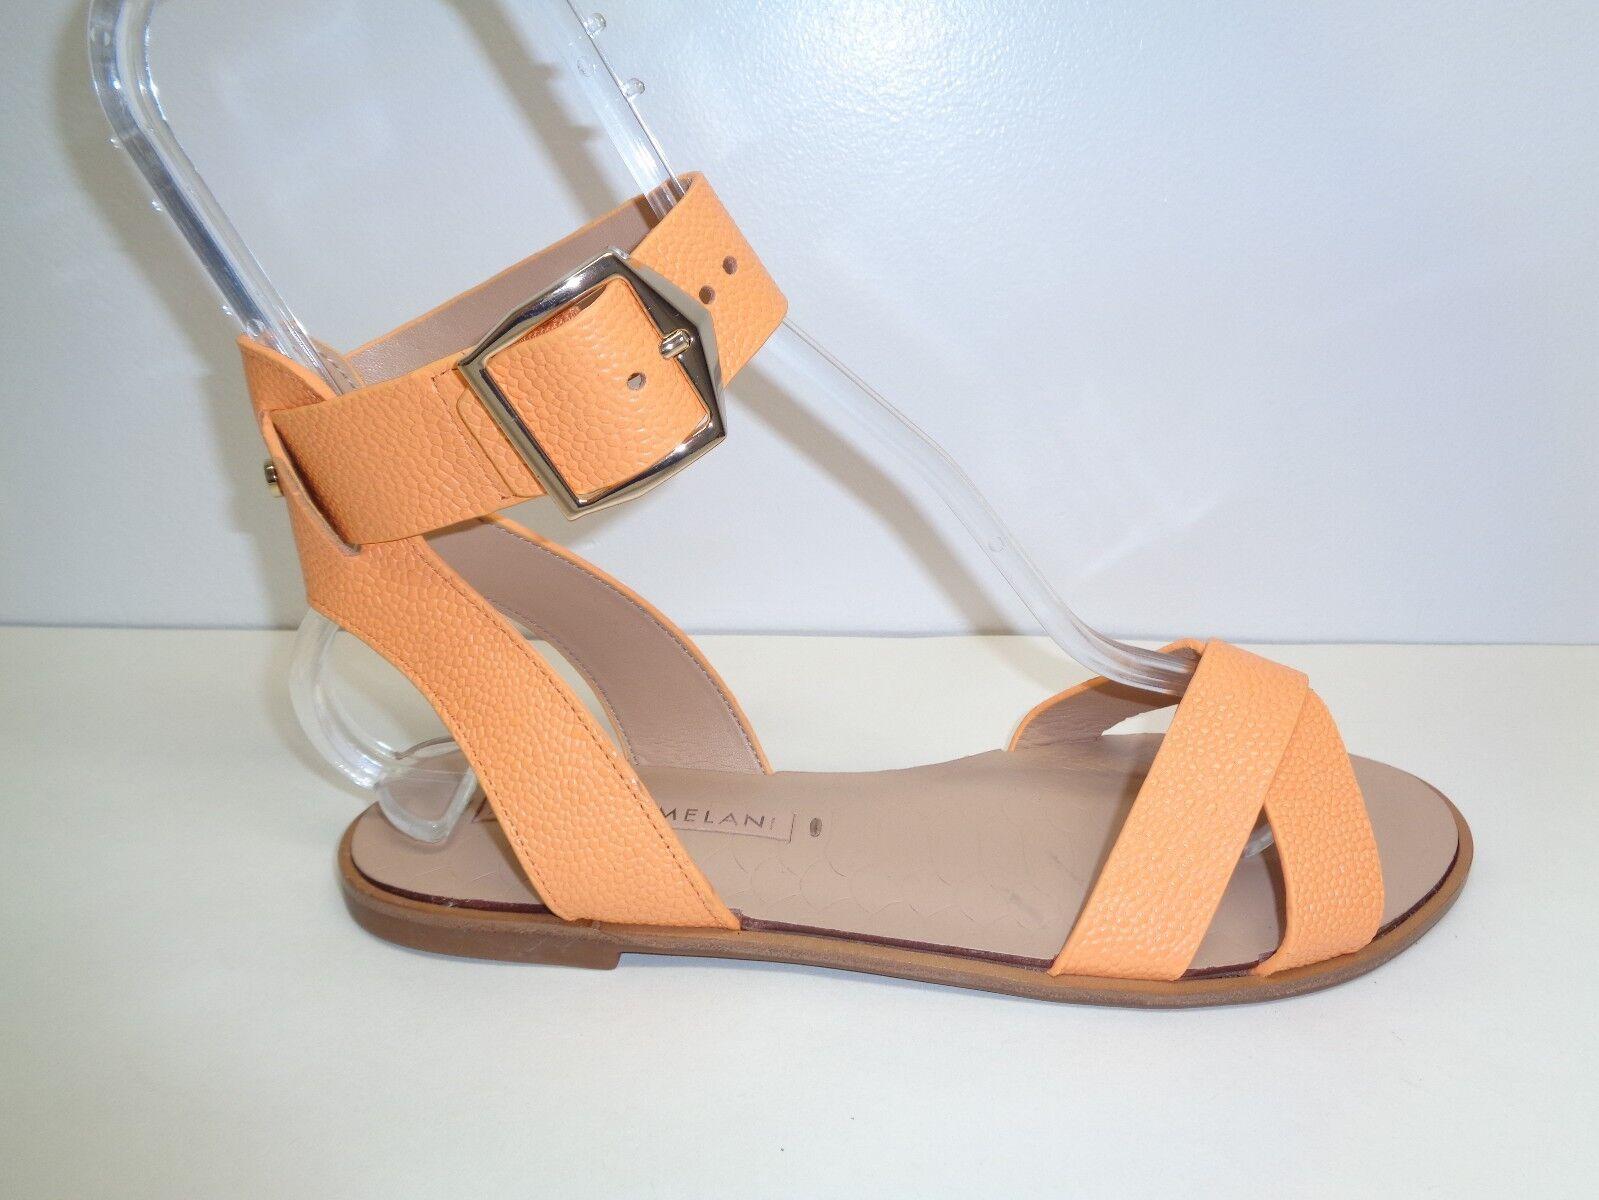 Antonio Melani Größe 7.5 M DUANE Orange Leder Cross Sandales NEU Damenschuhe Schuhes